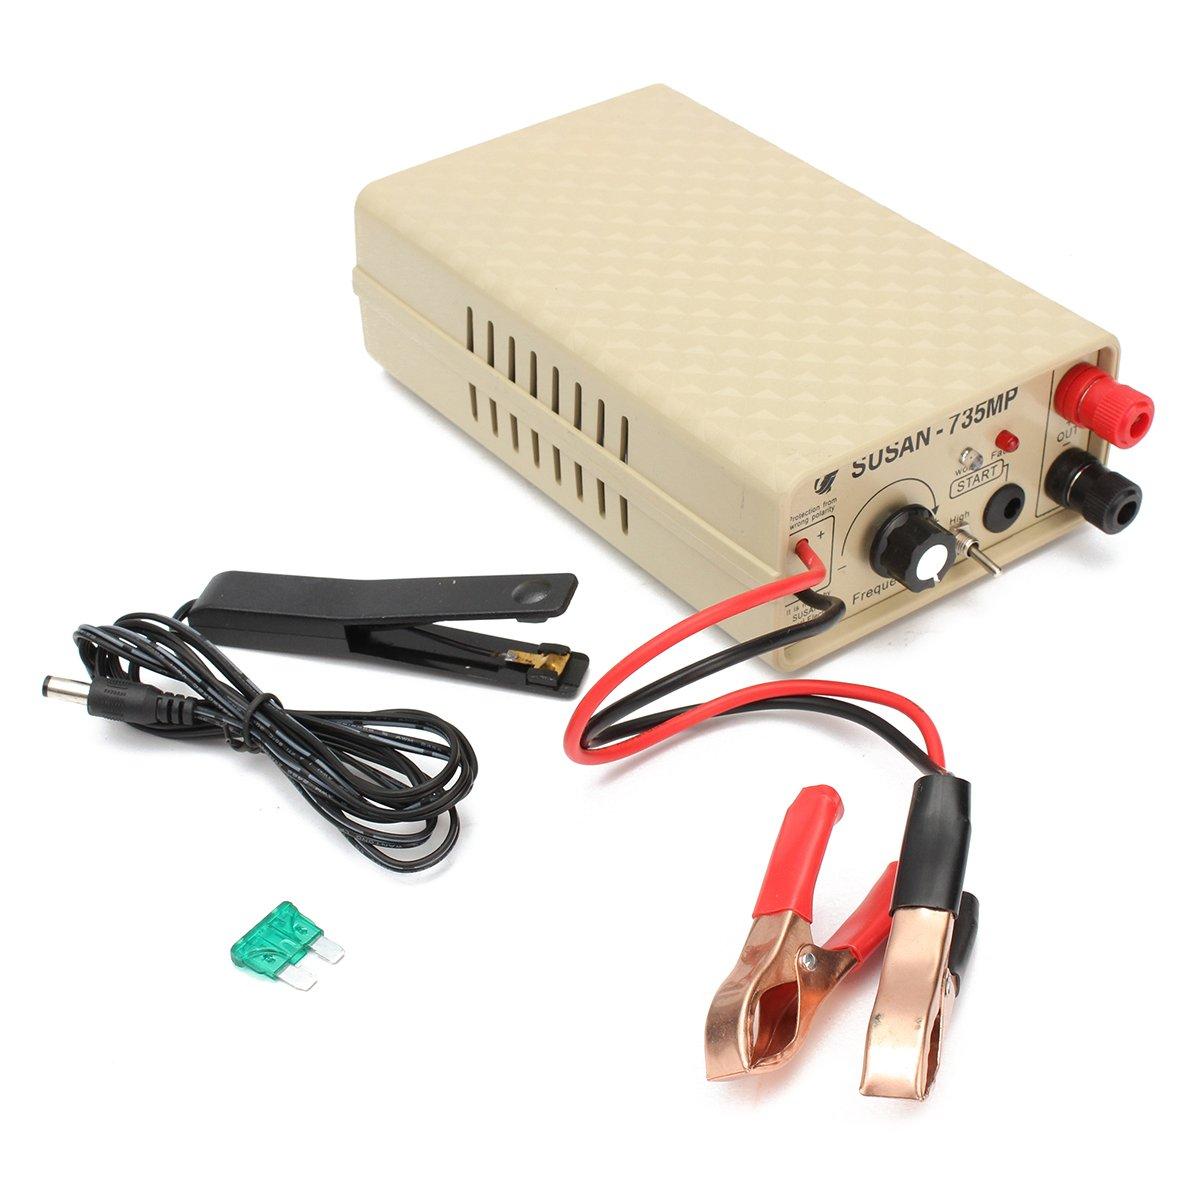 735MP Ultrasonic Inverter Electro Fishing Fisher Machine Fish Stunner